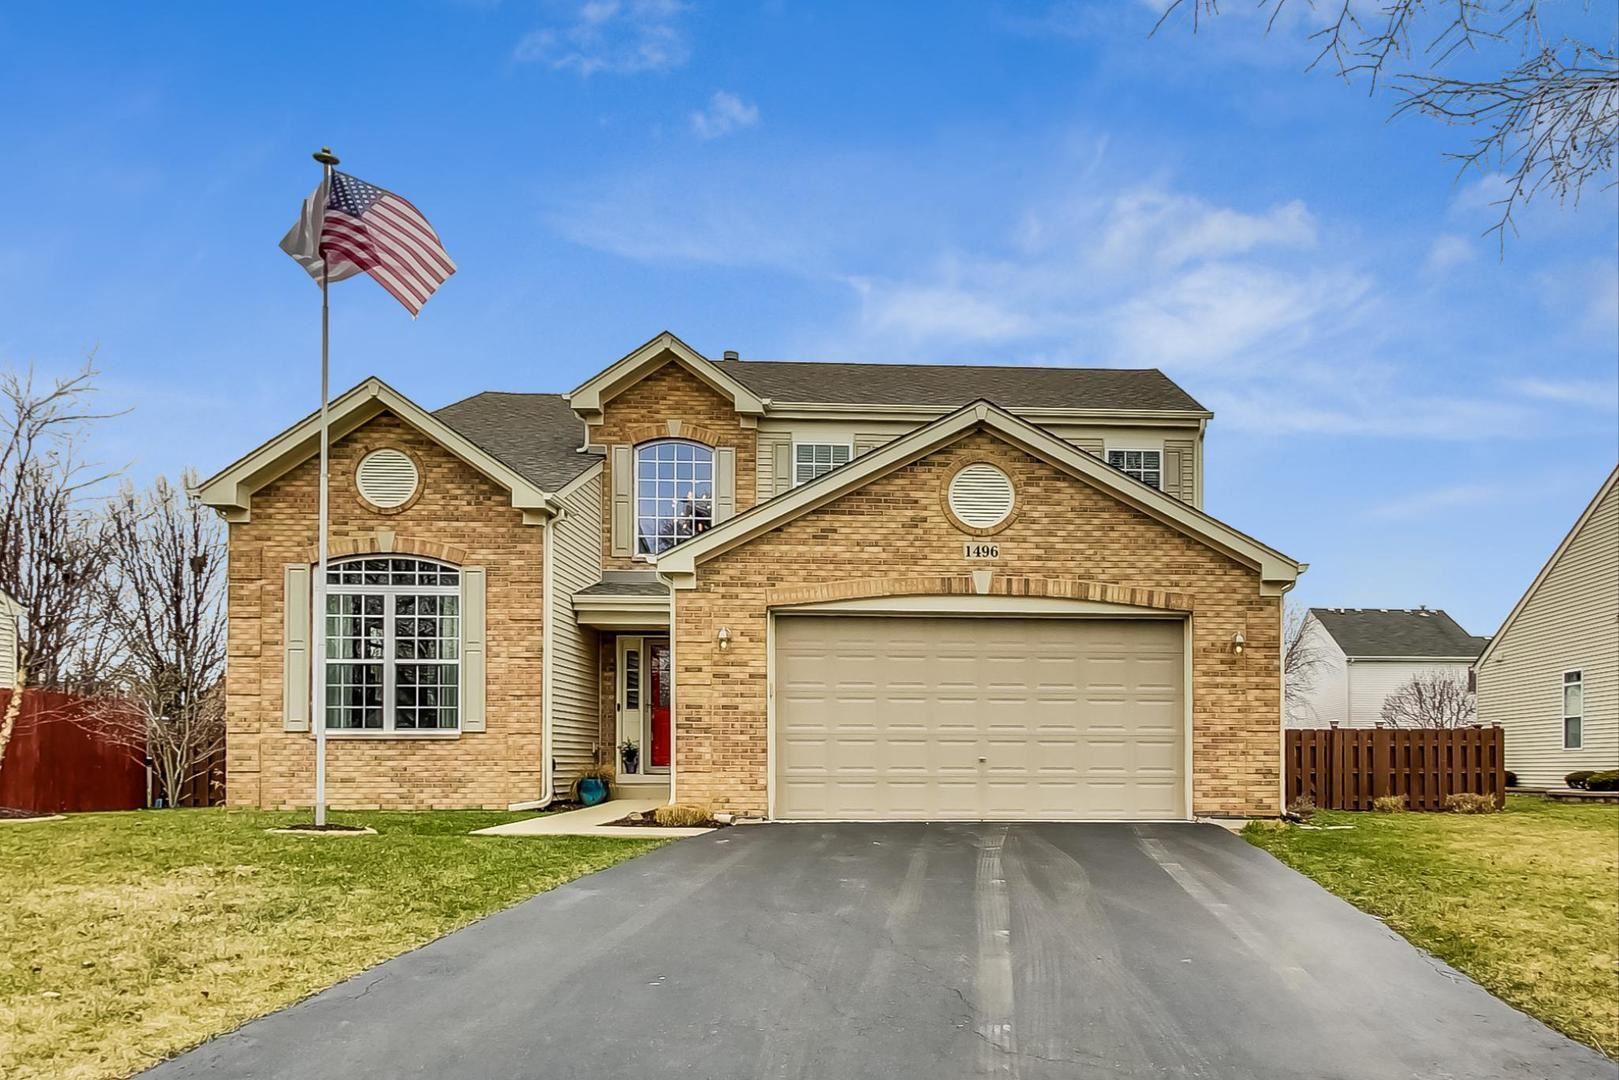 Photo of 1496 Misty Lane, Bolingbrook, IL 60490 (MLS # 11038389)